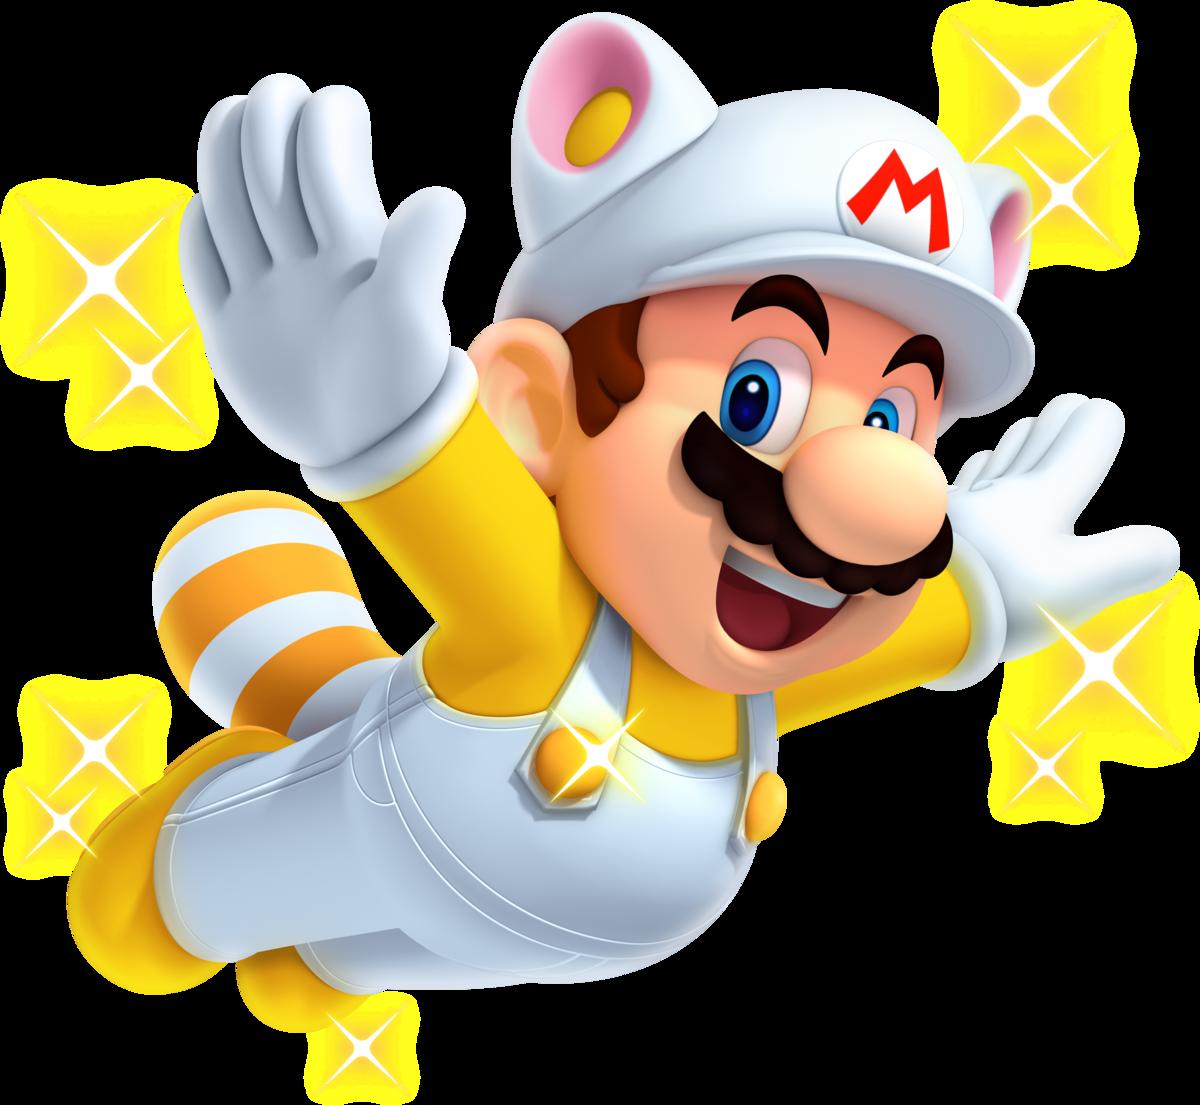 White Raccoon Mario Super Mario